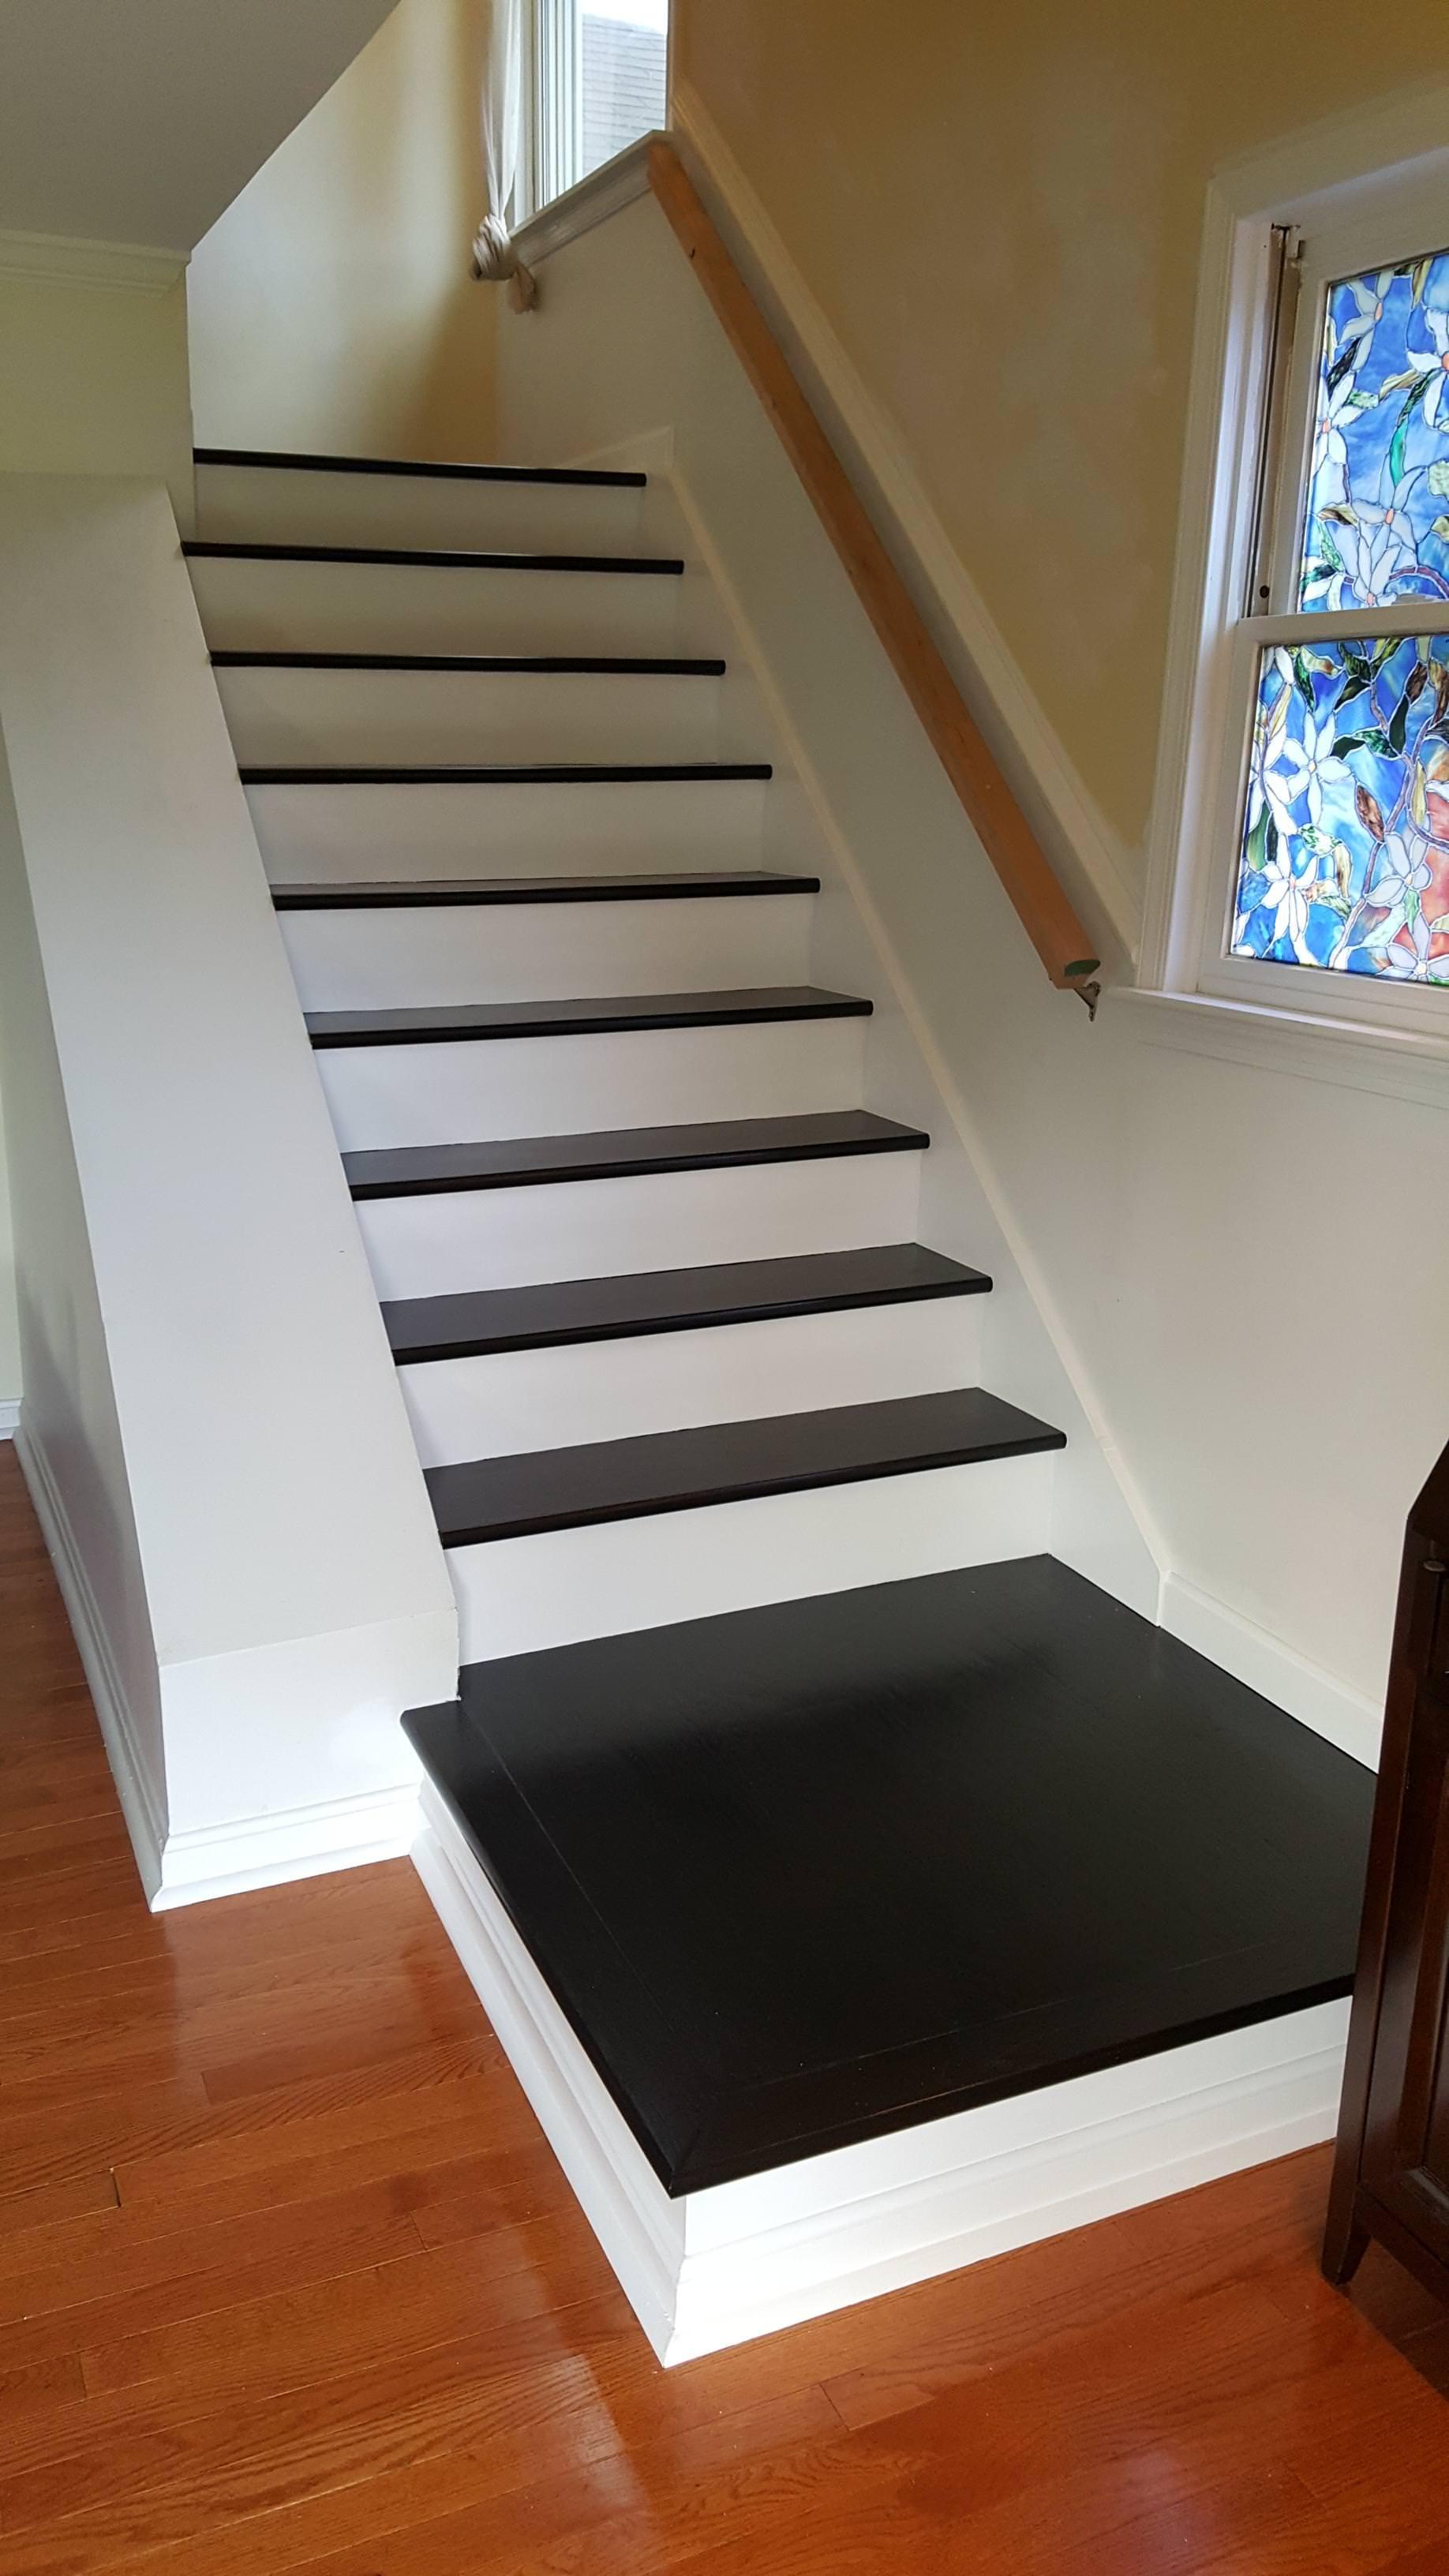 Carpet stairs i converted my carpet stairs to hardwood - album on imgur UFWRHOH